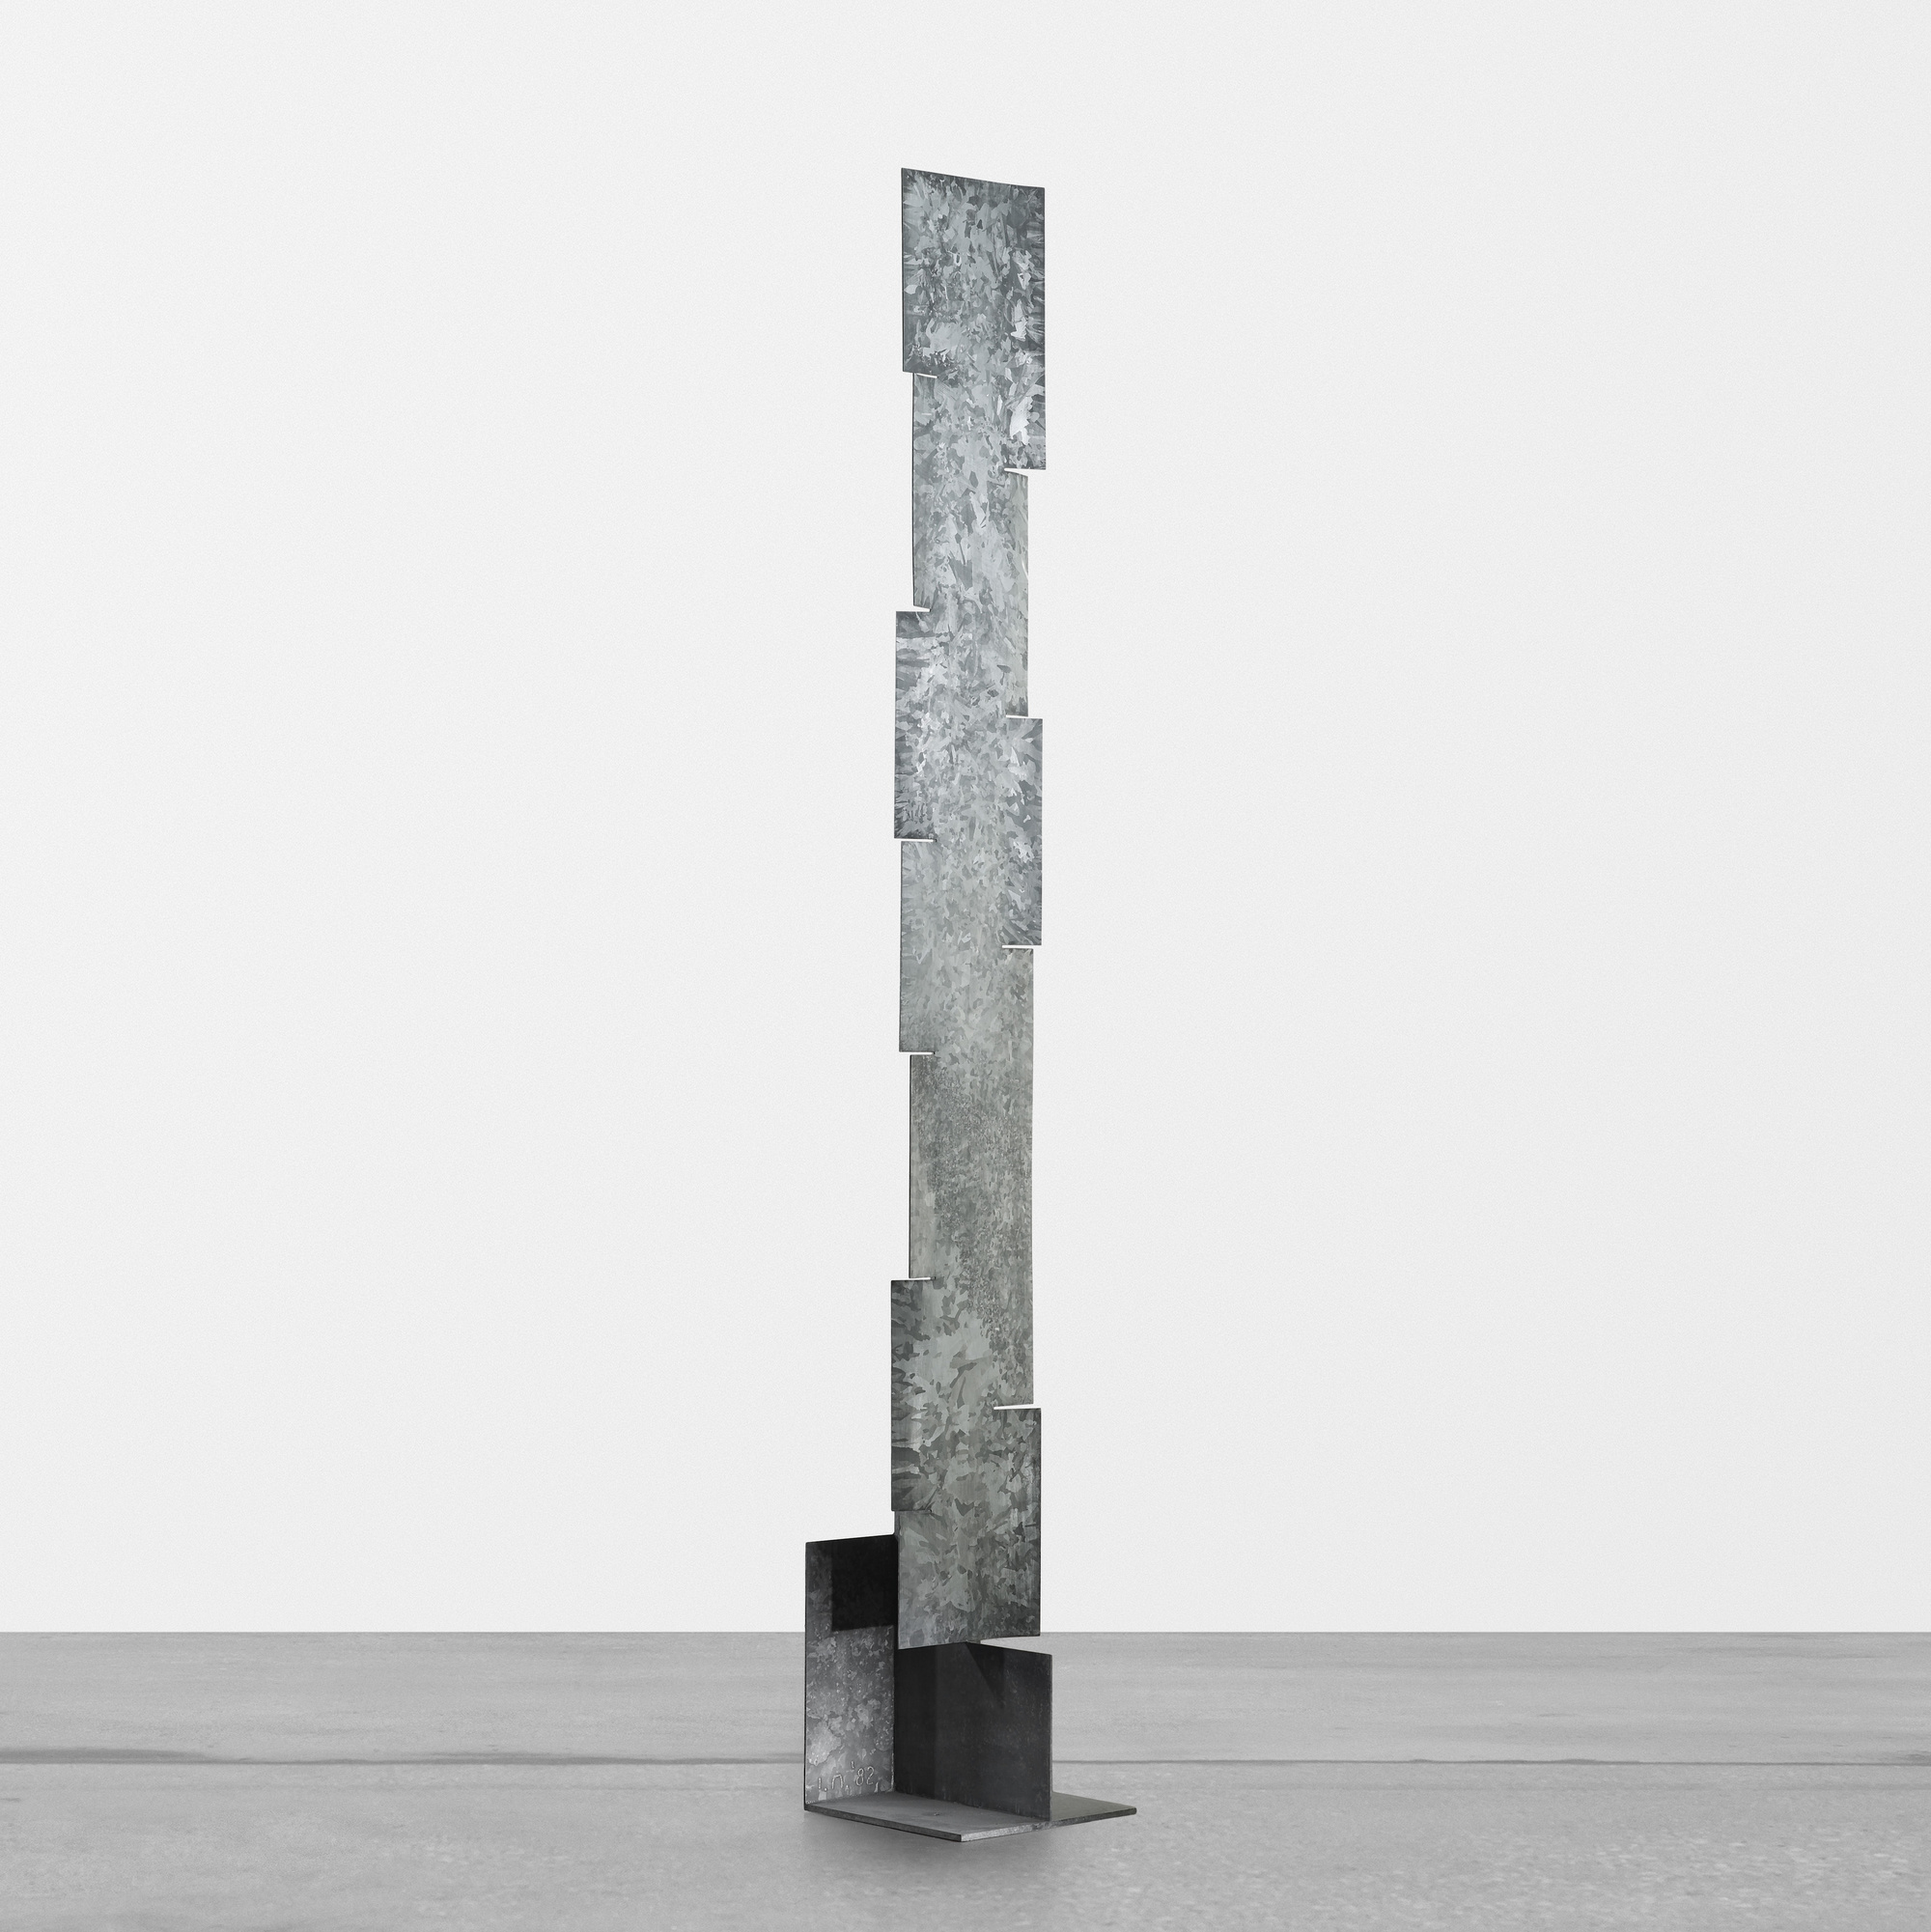 305: Isamu Noguchi / Wind Catcher (IN82-2088) (1 of 2)